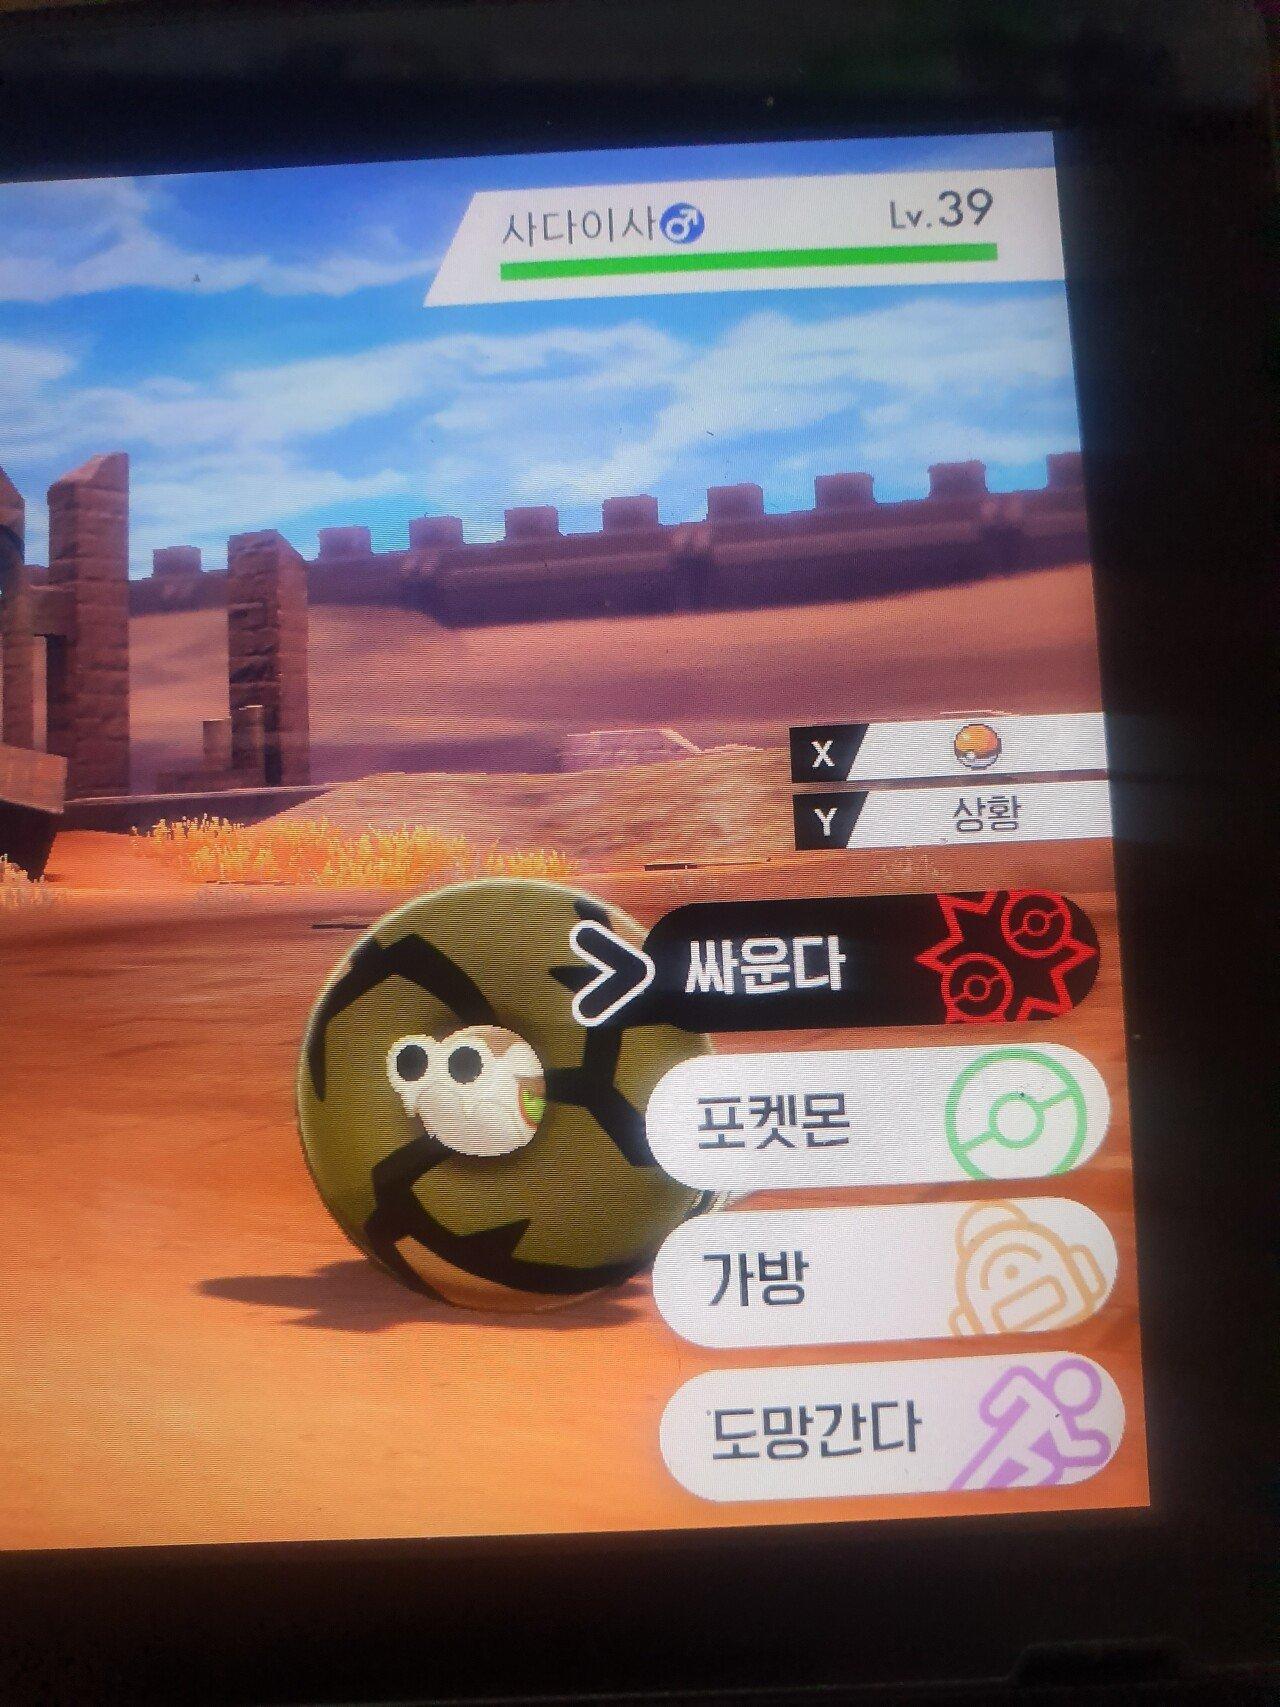 pokemon-20191112-122535-000.jpg 포켓몬 신작 신규 포켓몬 한글이름들.jpg